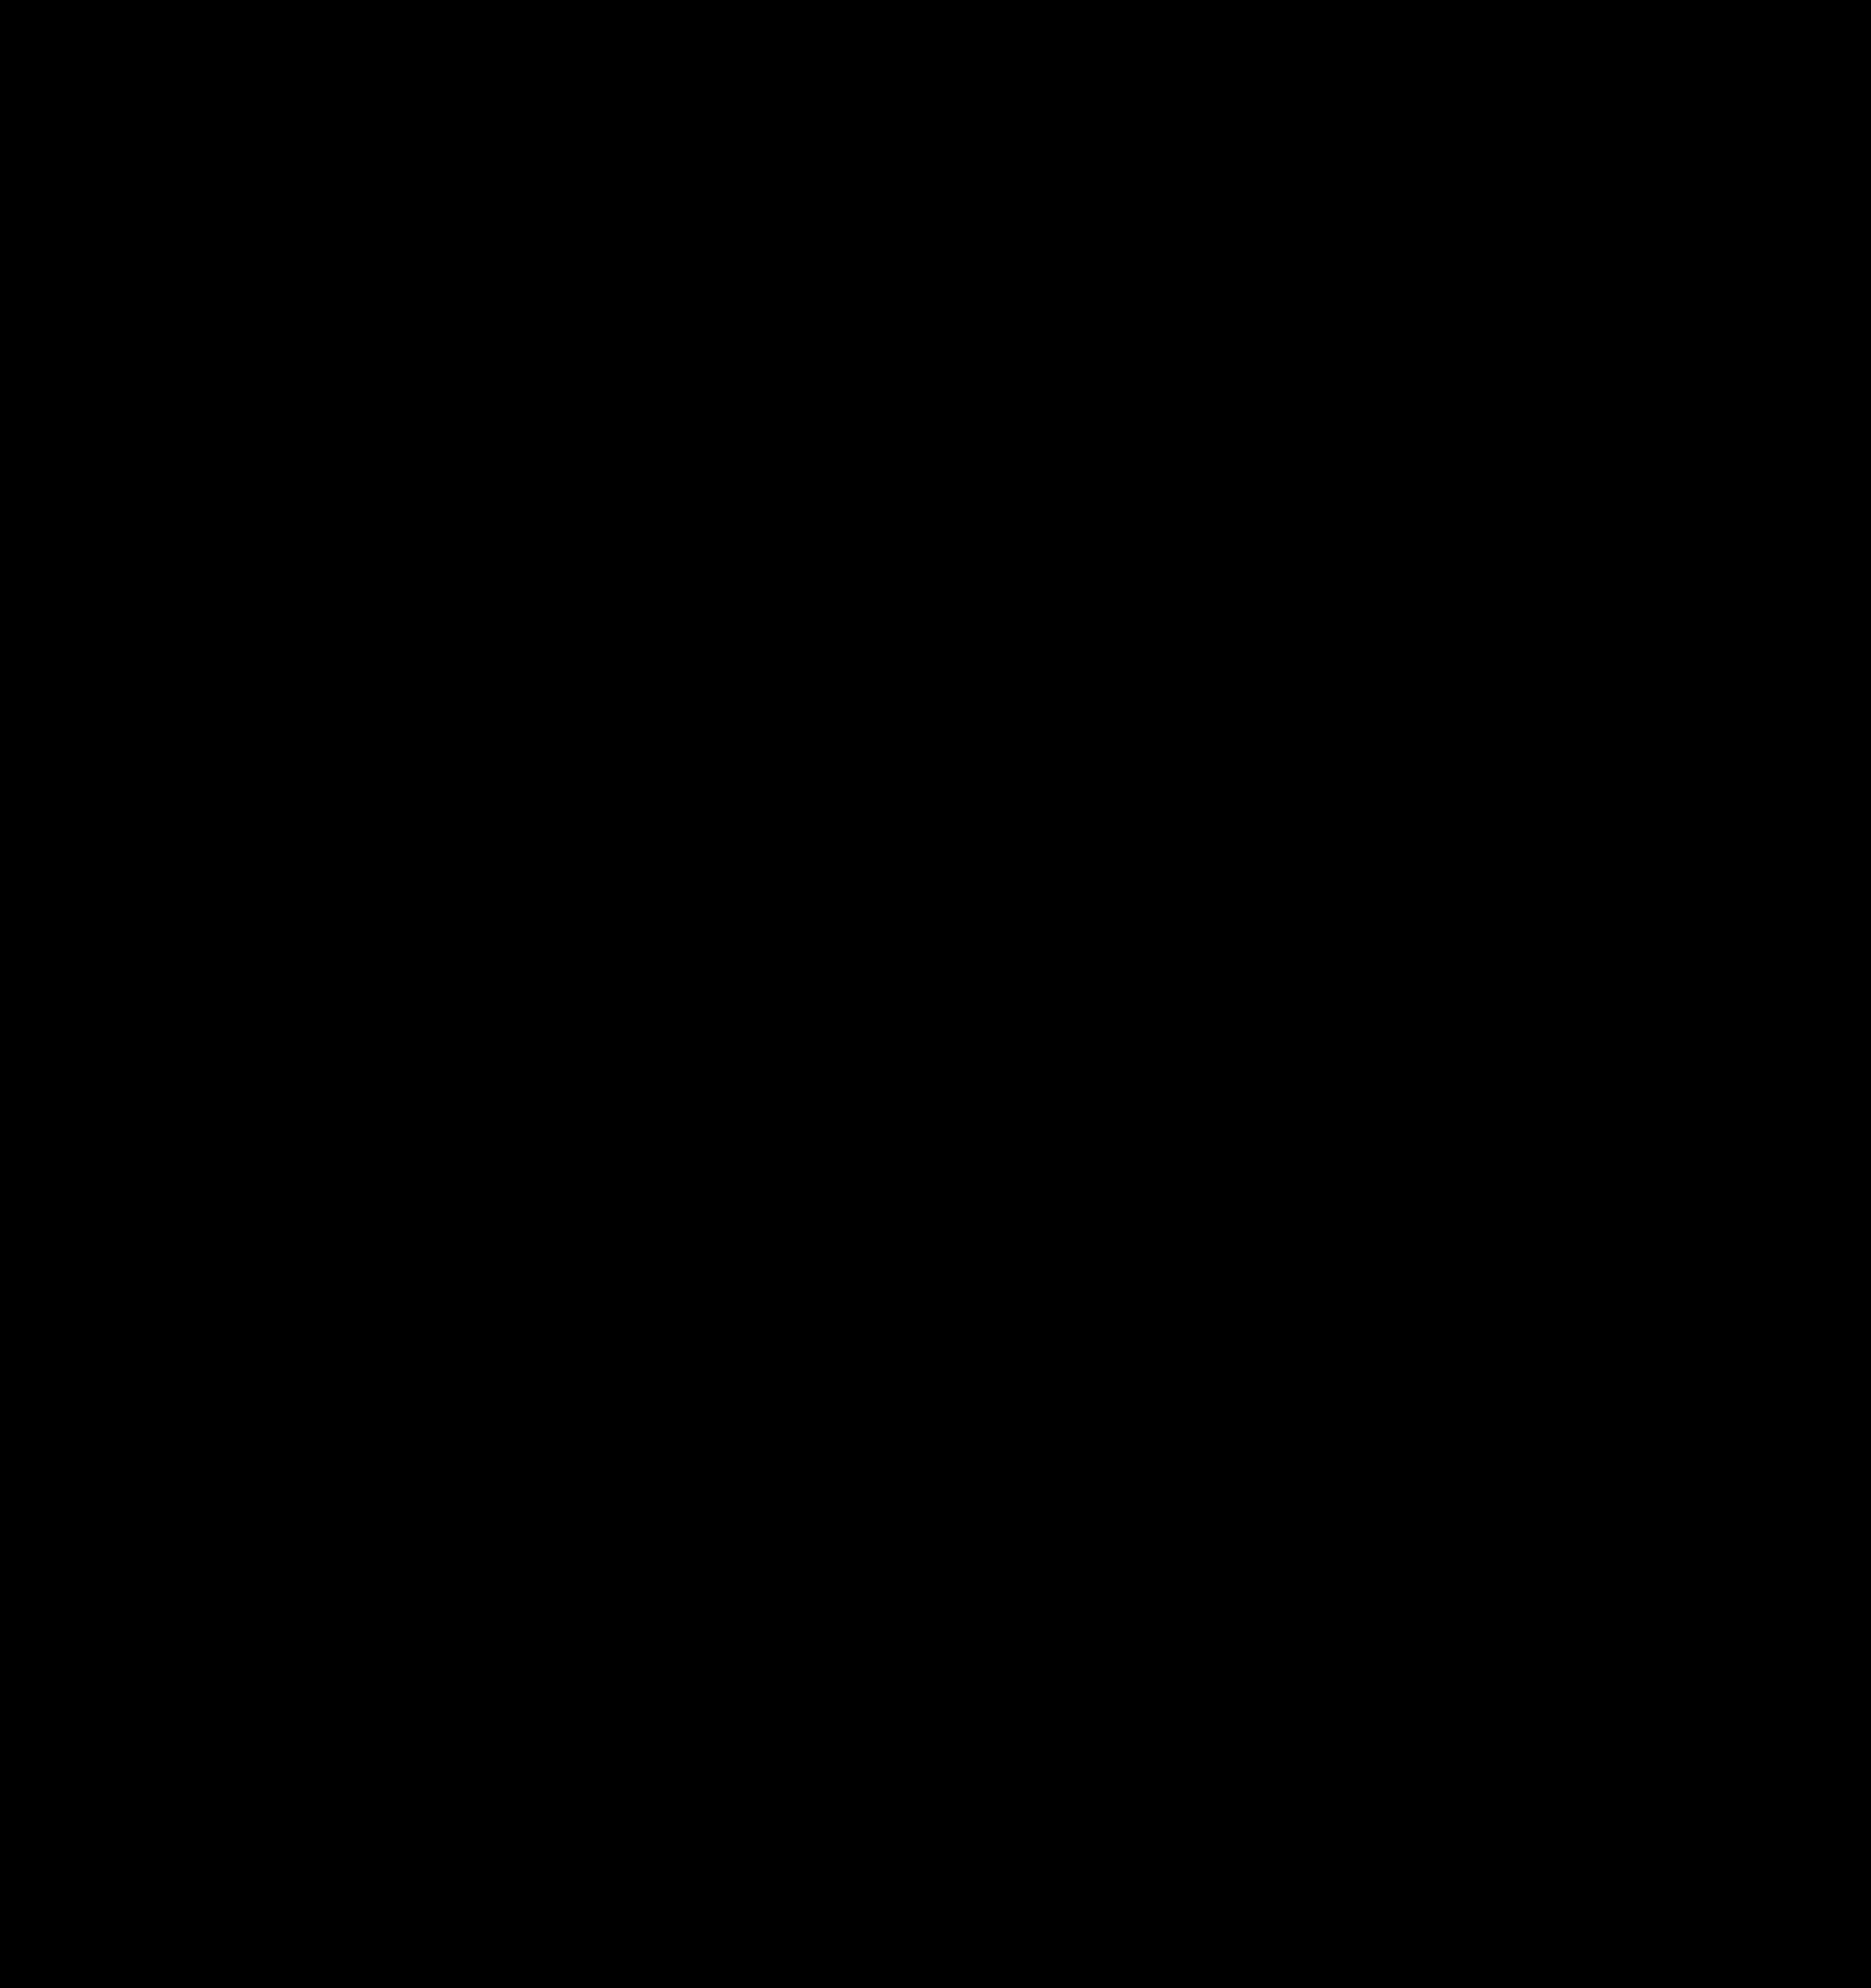 Почтальон PNG